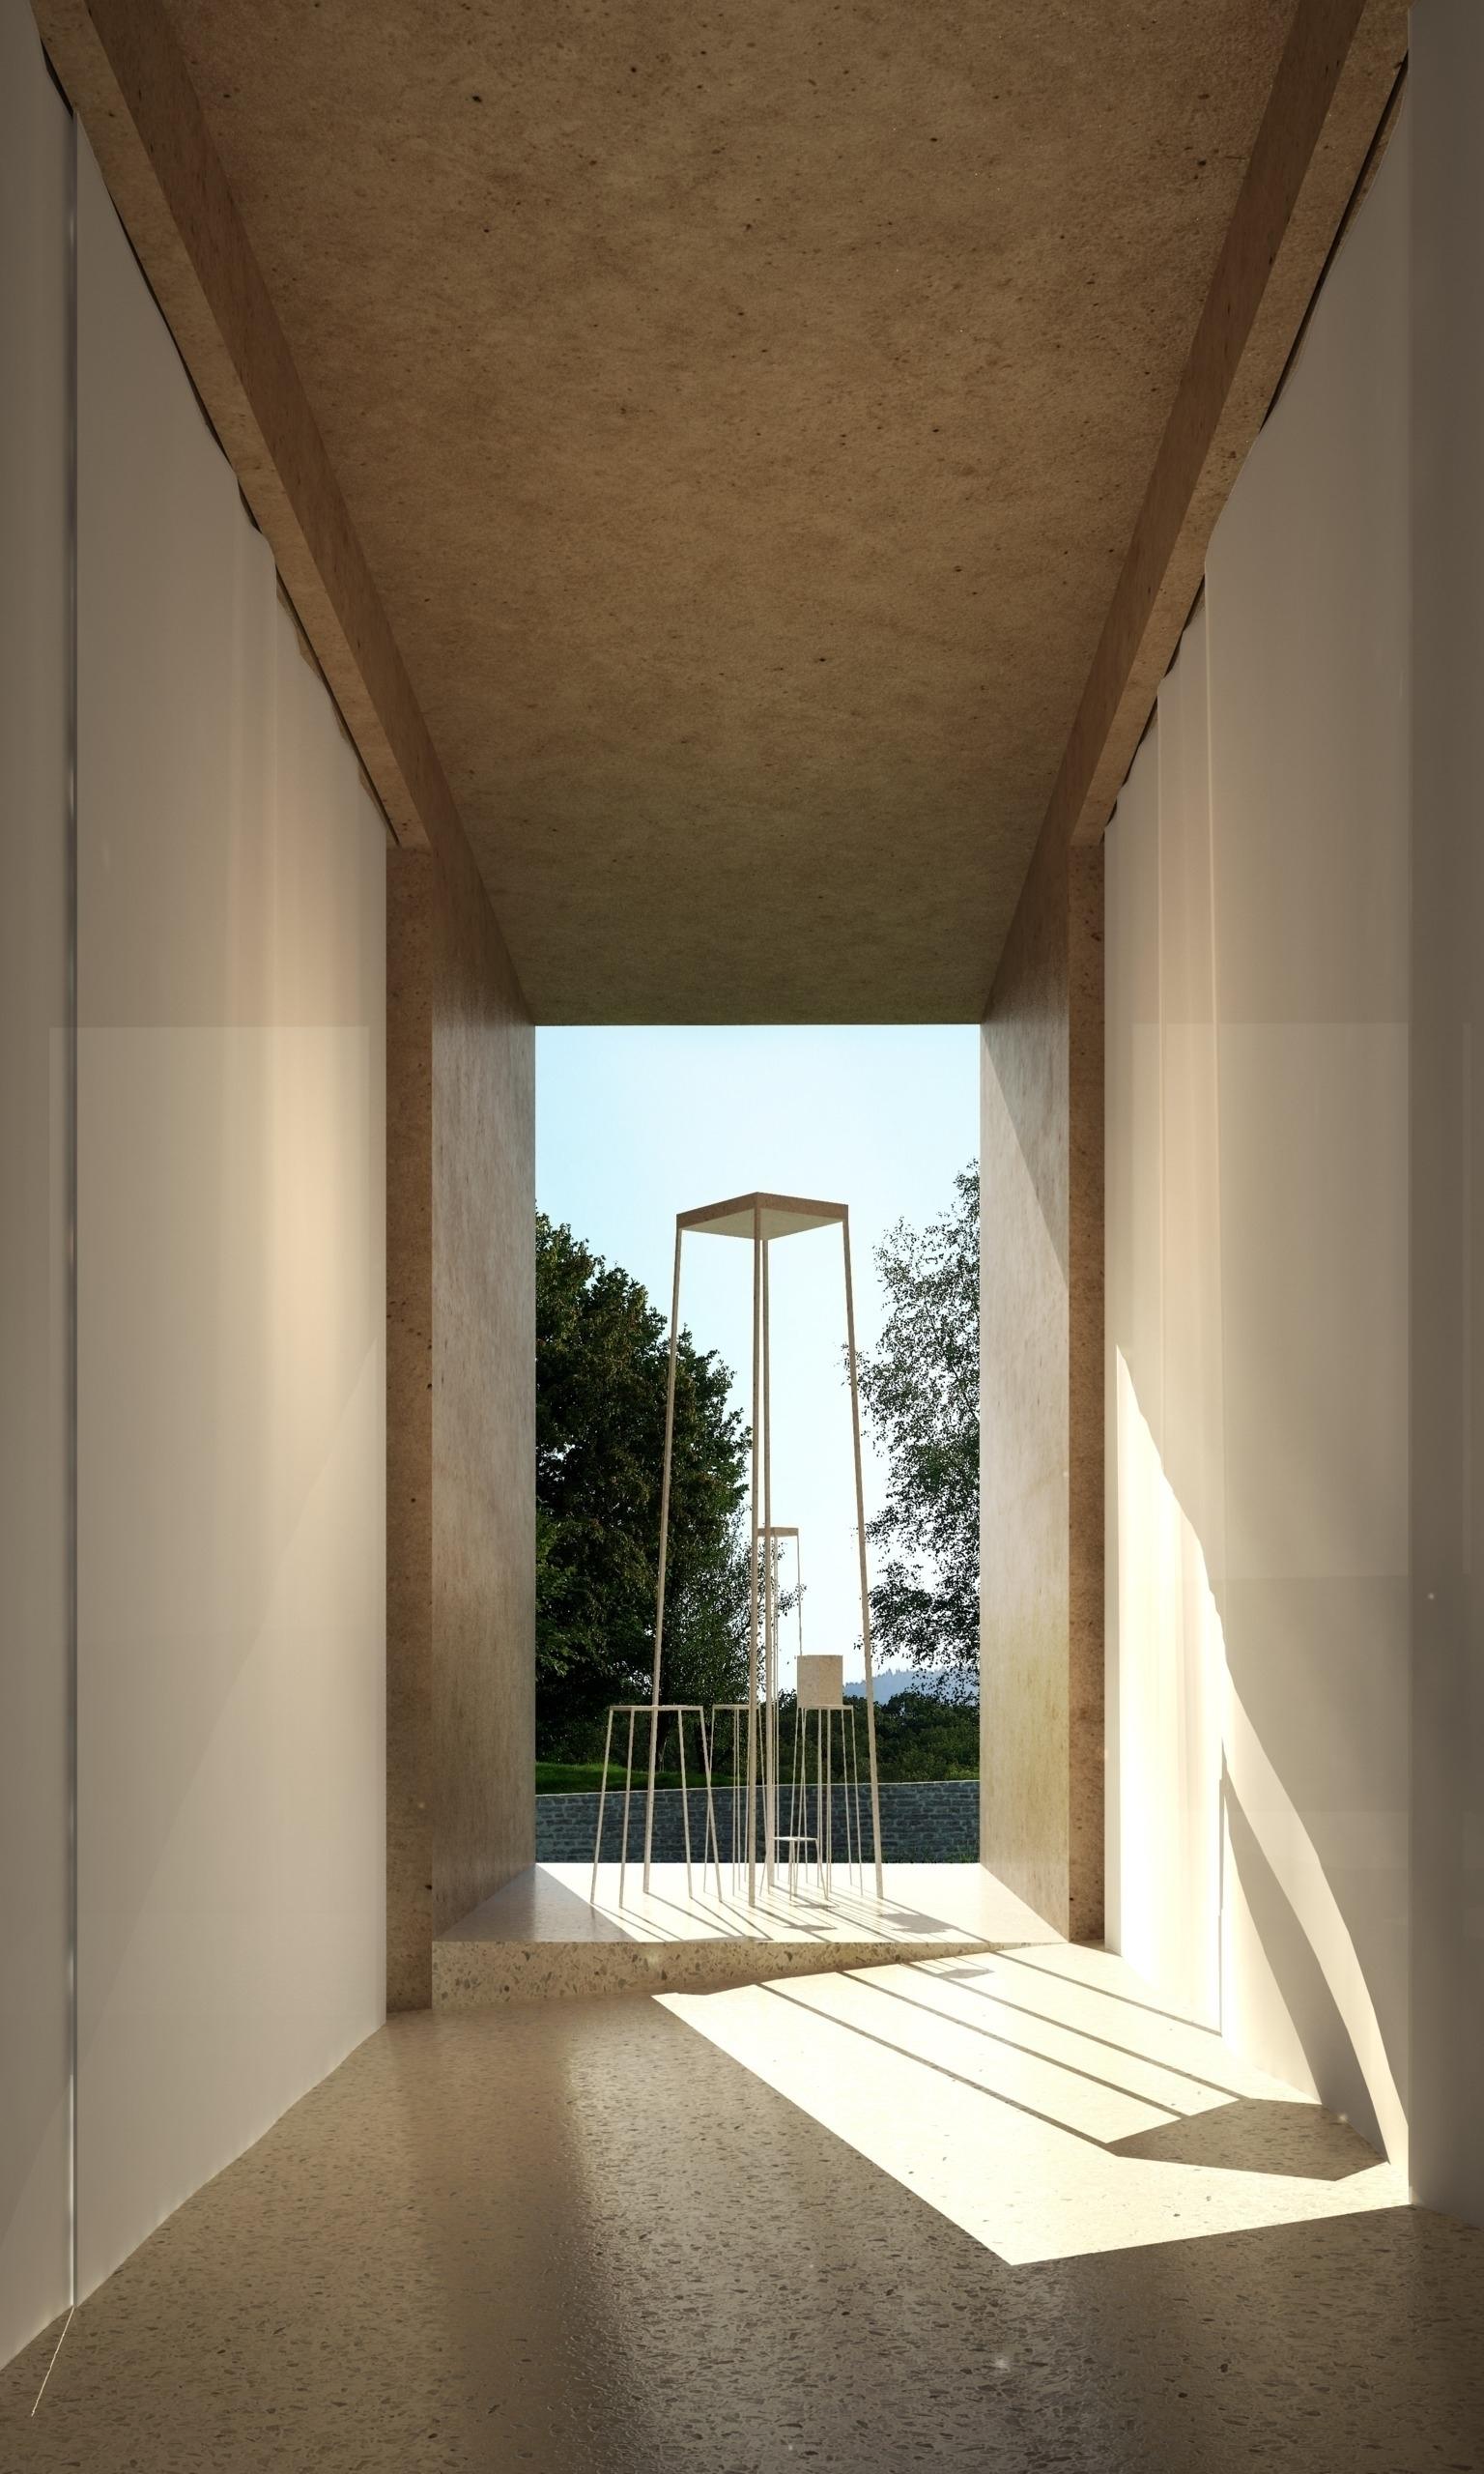 trama - architecture - andreitheodorionita | ello